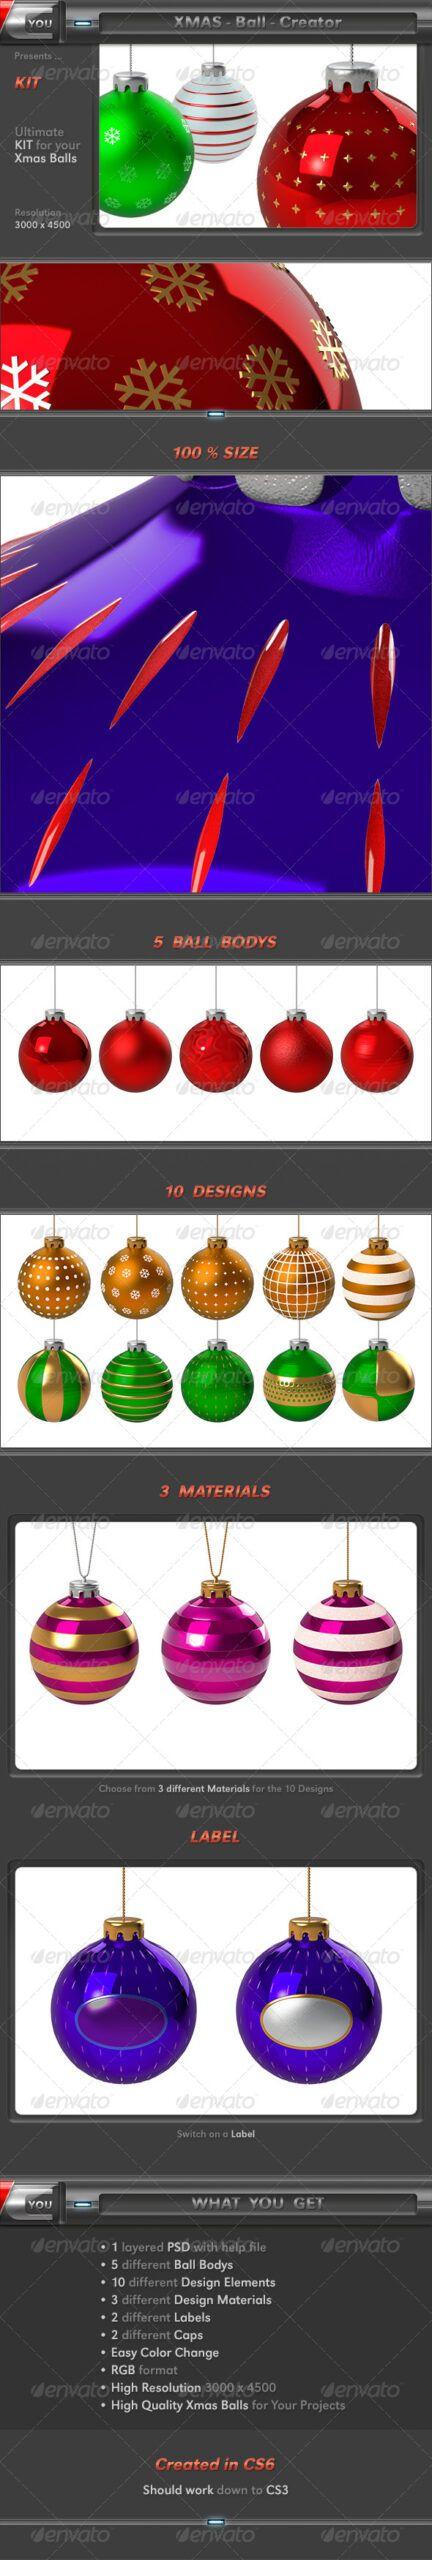 Free Download Xmas Ball Creator In 2020 The Creator Design Christmas Design